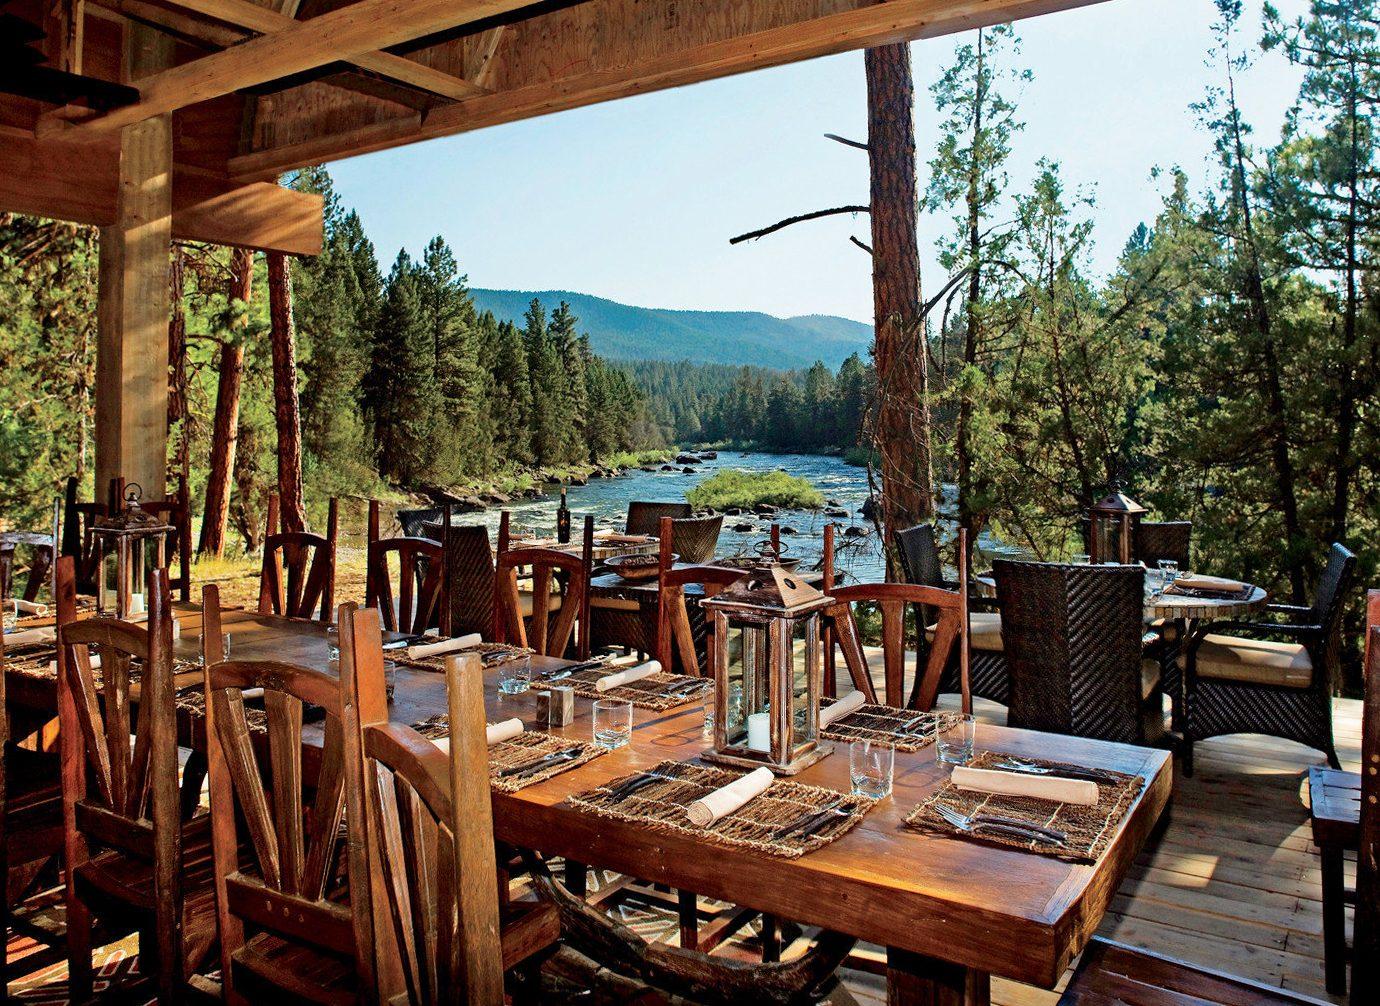 outdoor dining at Resort at Paws Up